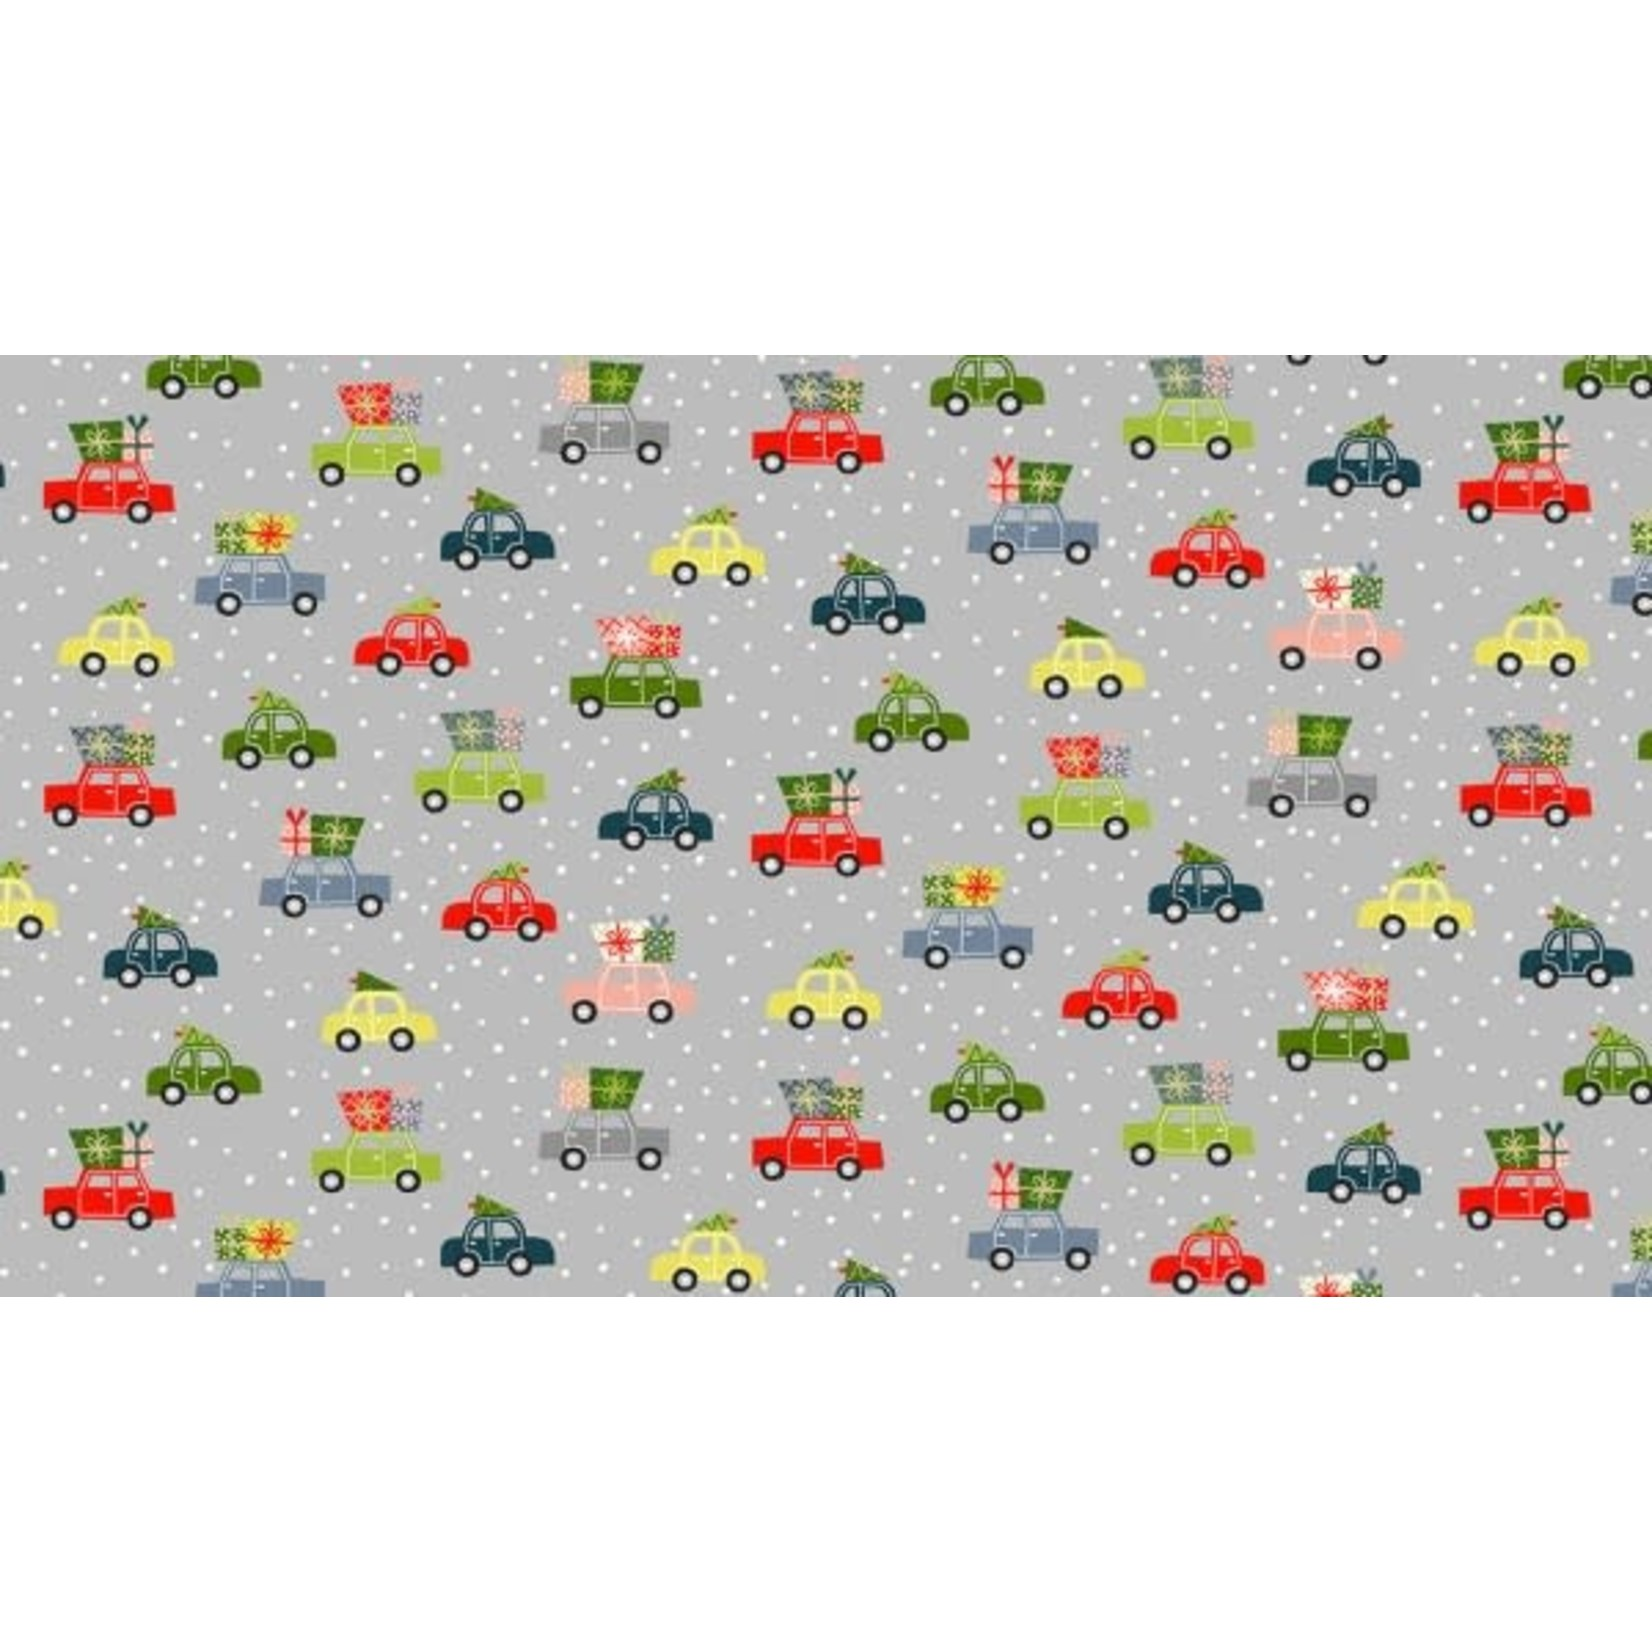 MAKOWER JOY - Cars - Grey, per cm or $20/m